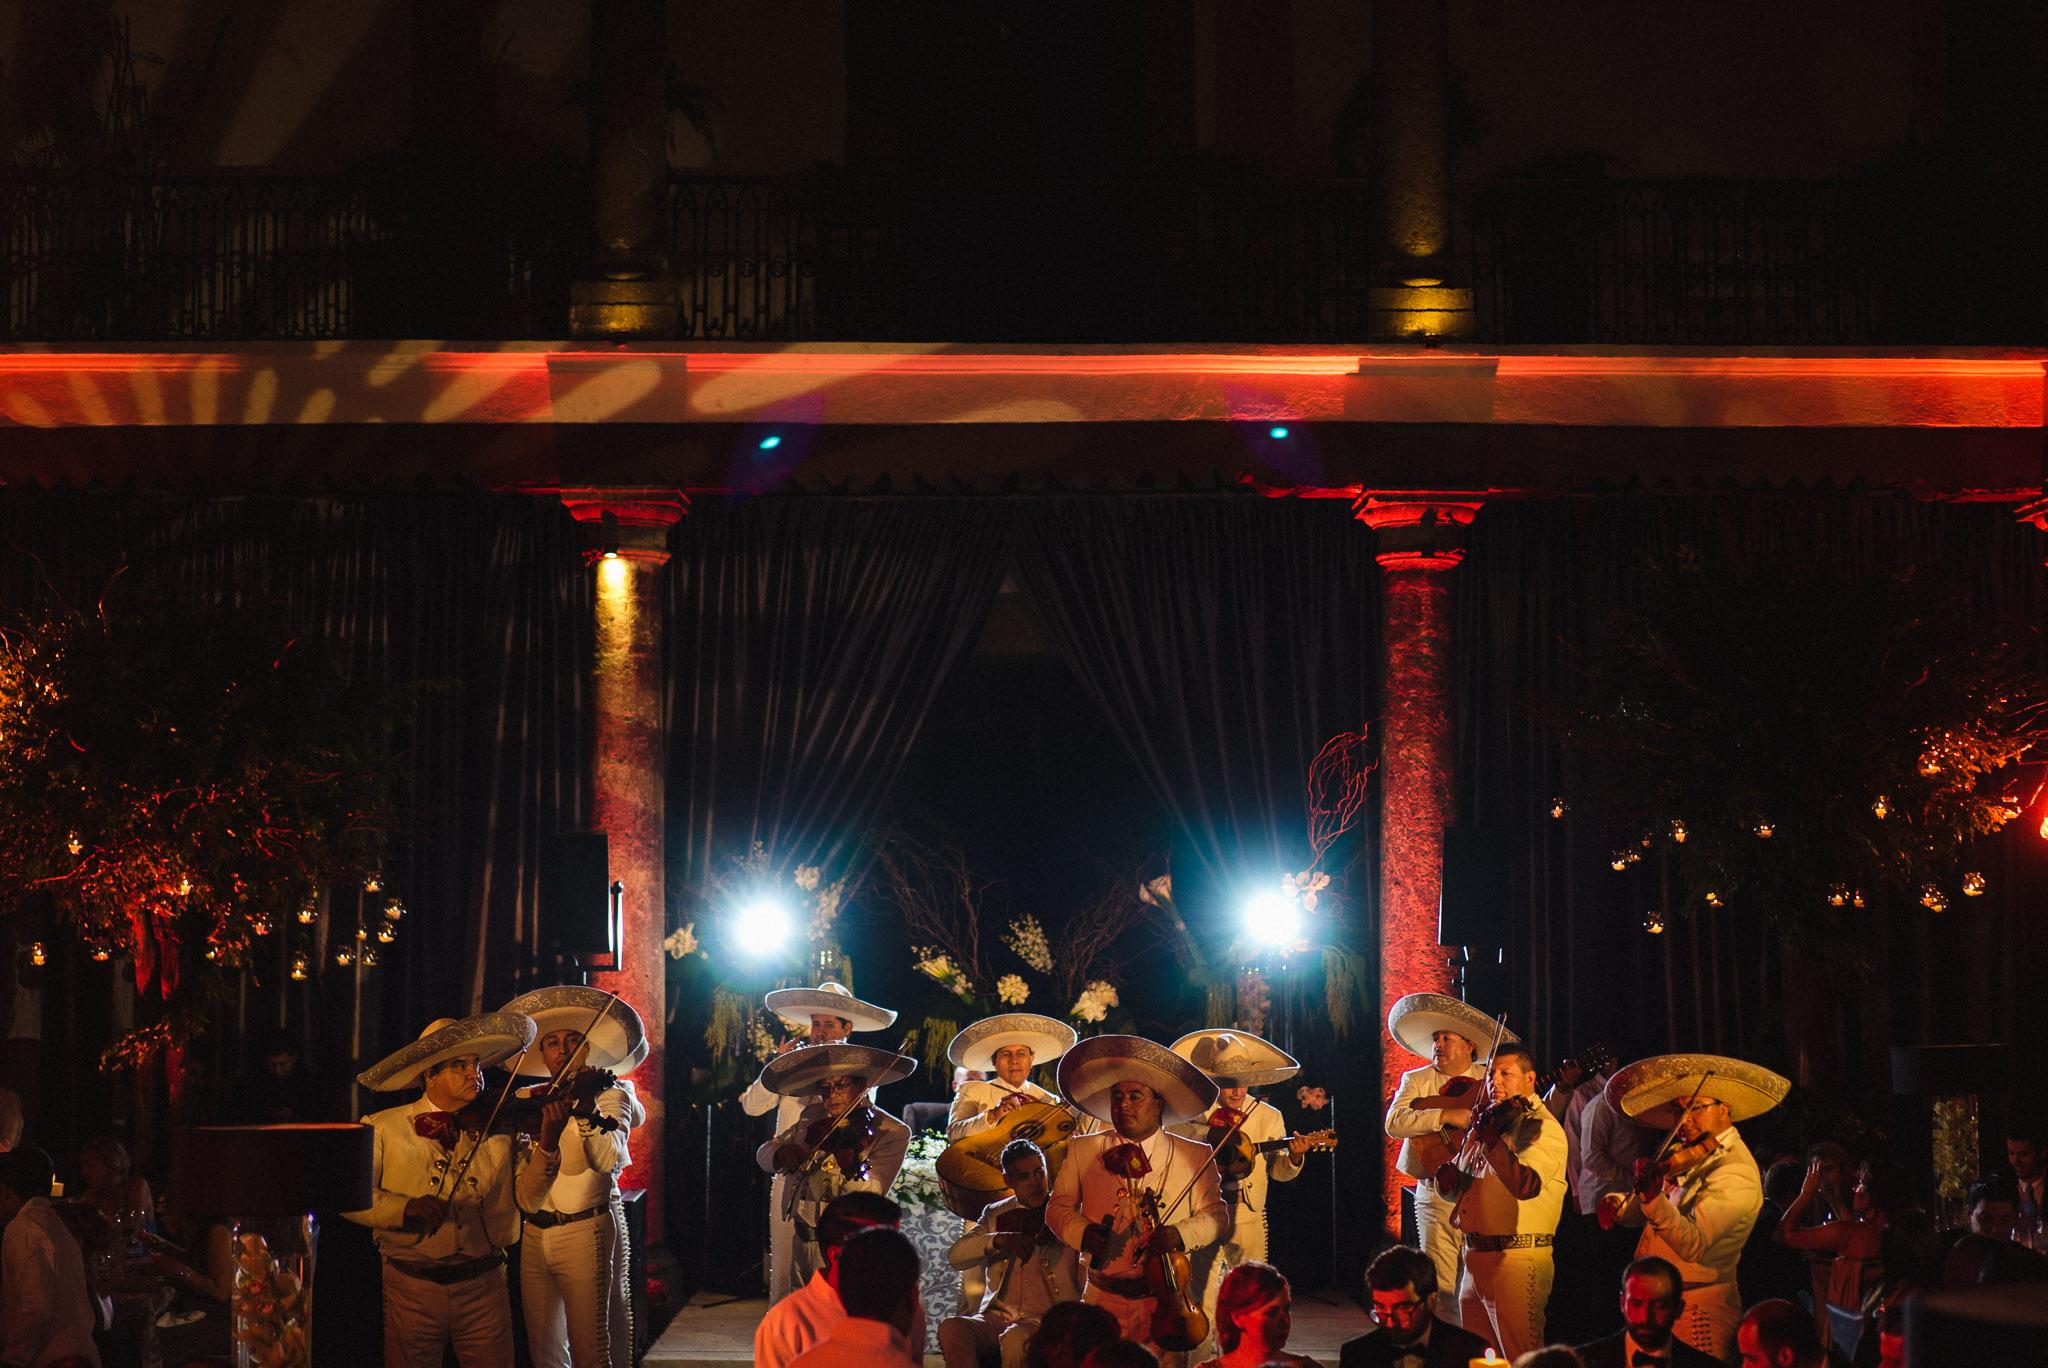 ©www.mauriziosolisbroca.com-20161001maurizio-solis-broca-mexico-canada-wedding-photographer20161001DSC08188-Edit.jpg